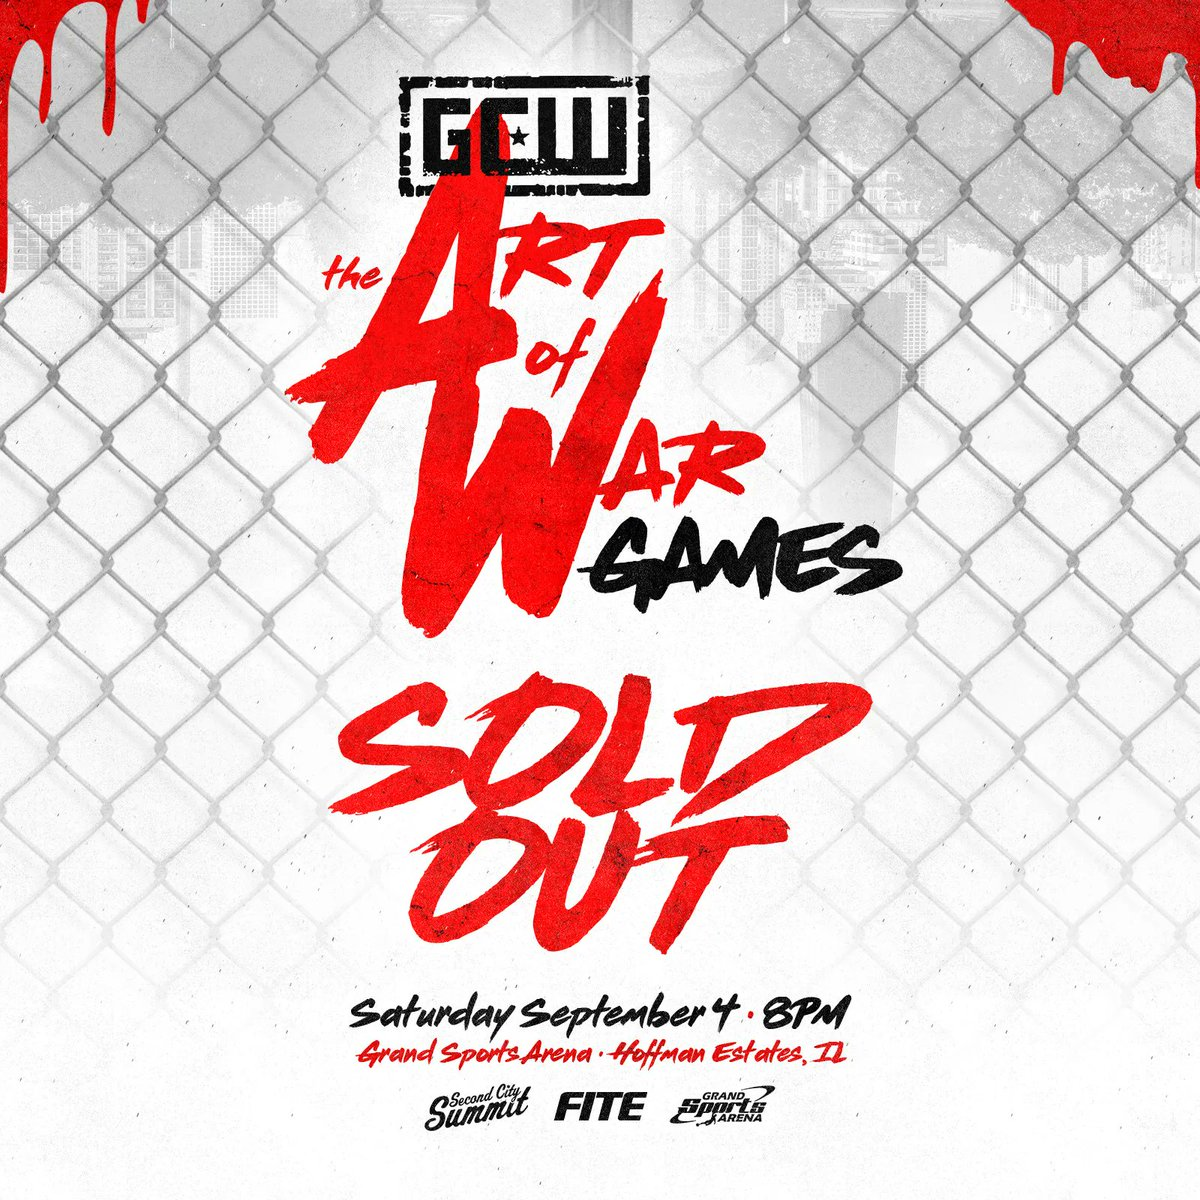 Poster for GCW Art of War Games